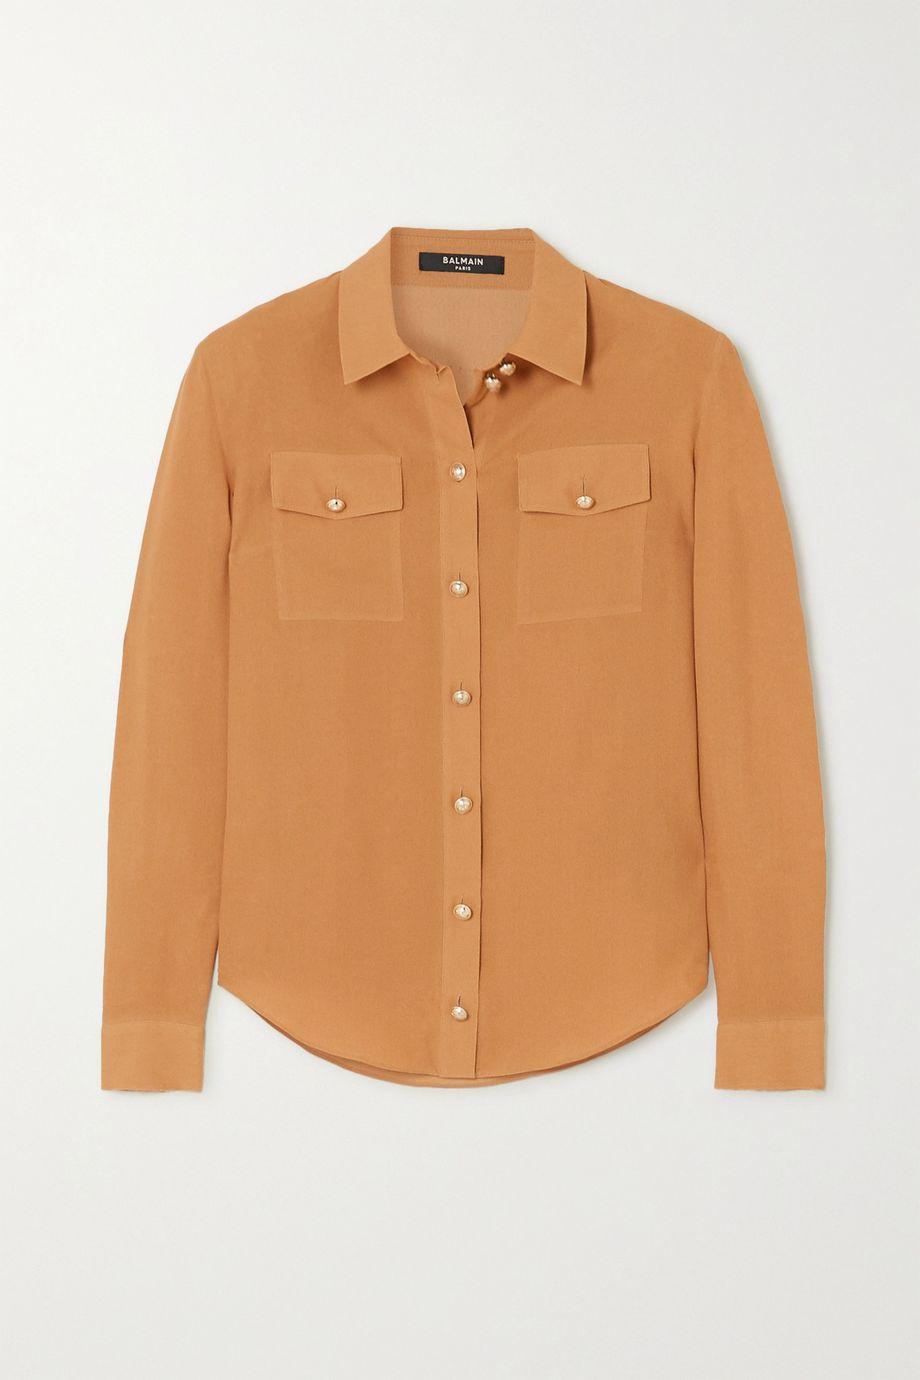 Balmain Silk crepe de chine blouse